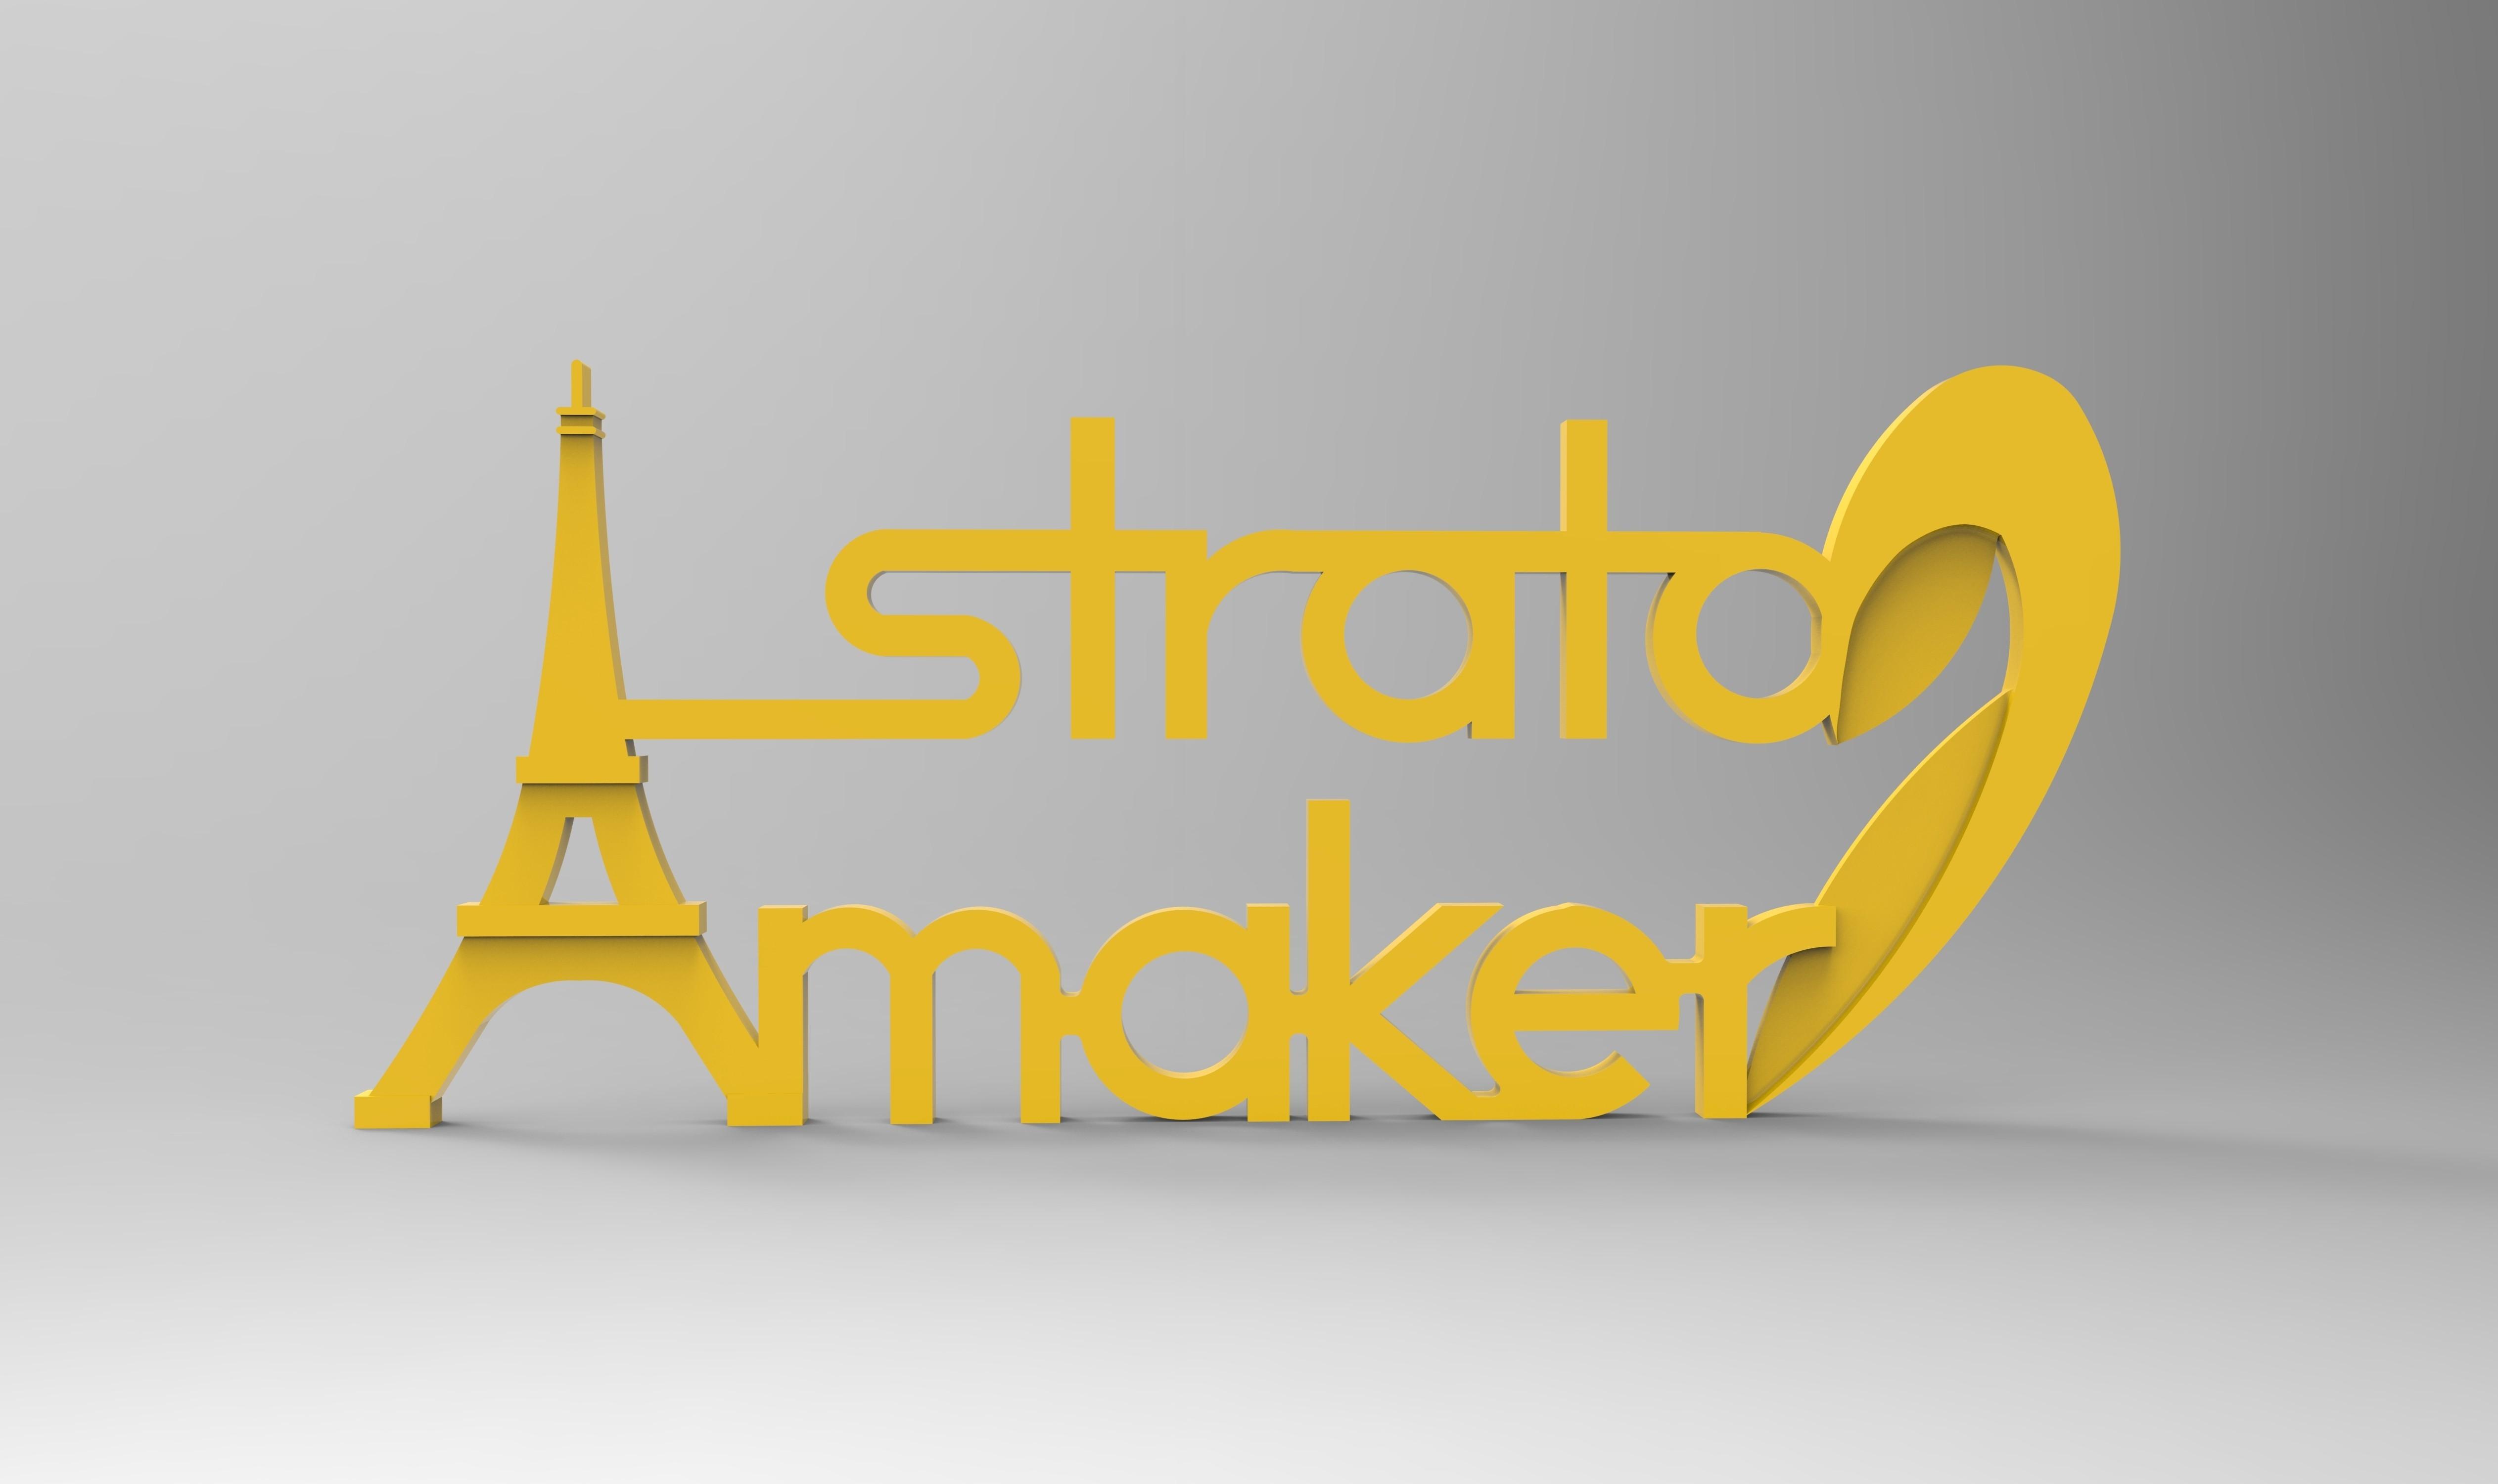 rendu plaque 2 face 265.jpg Download free STL file Stratomaker brand and logo (Eiffel Tower) • 3D printer model, GuilhemPerroud